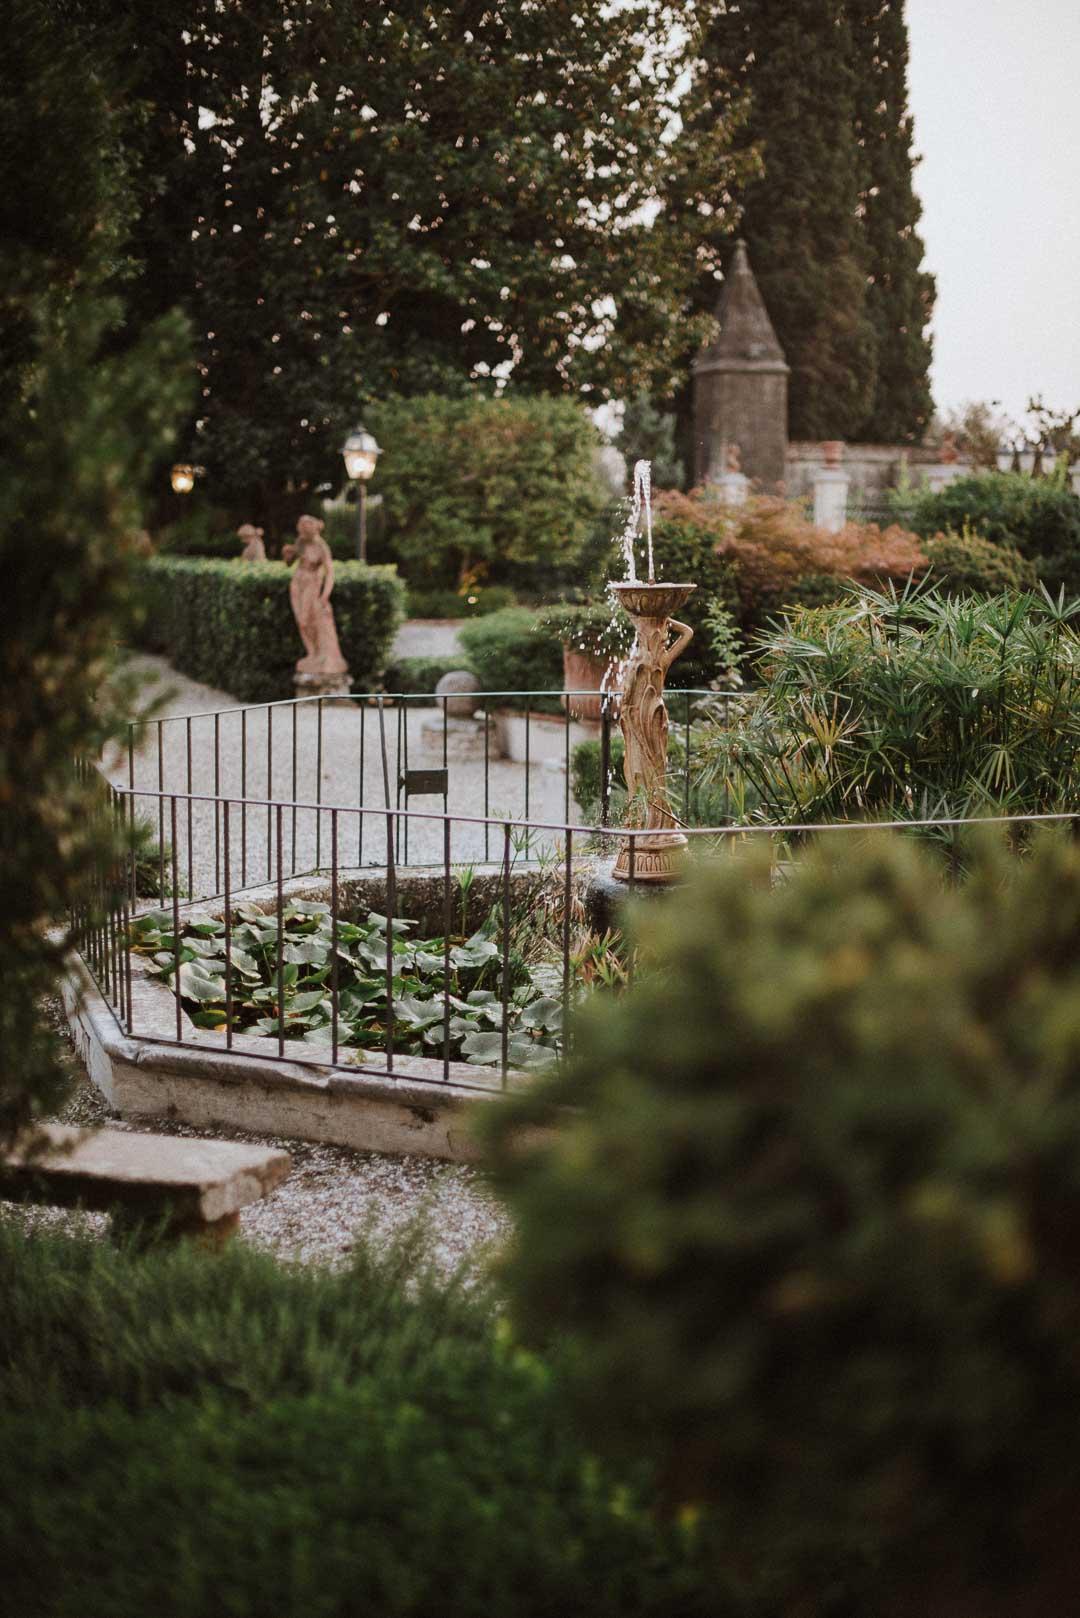 wedding-photographer-destination-fineart-bespoke-reportage-tuscany-villascorzi-vivianeizzo-spazio46-148